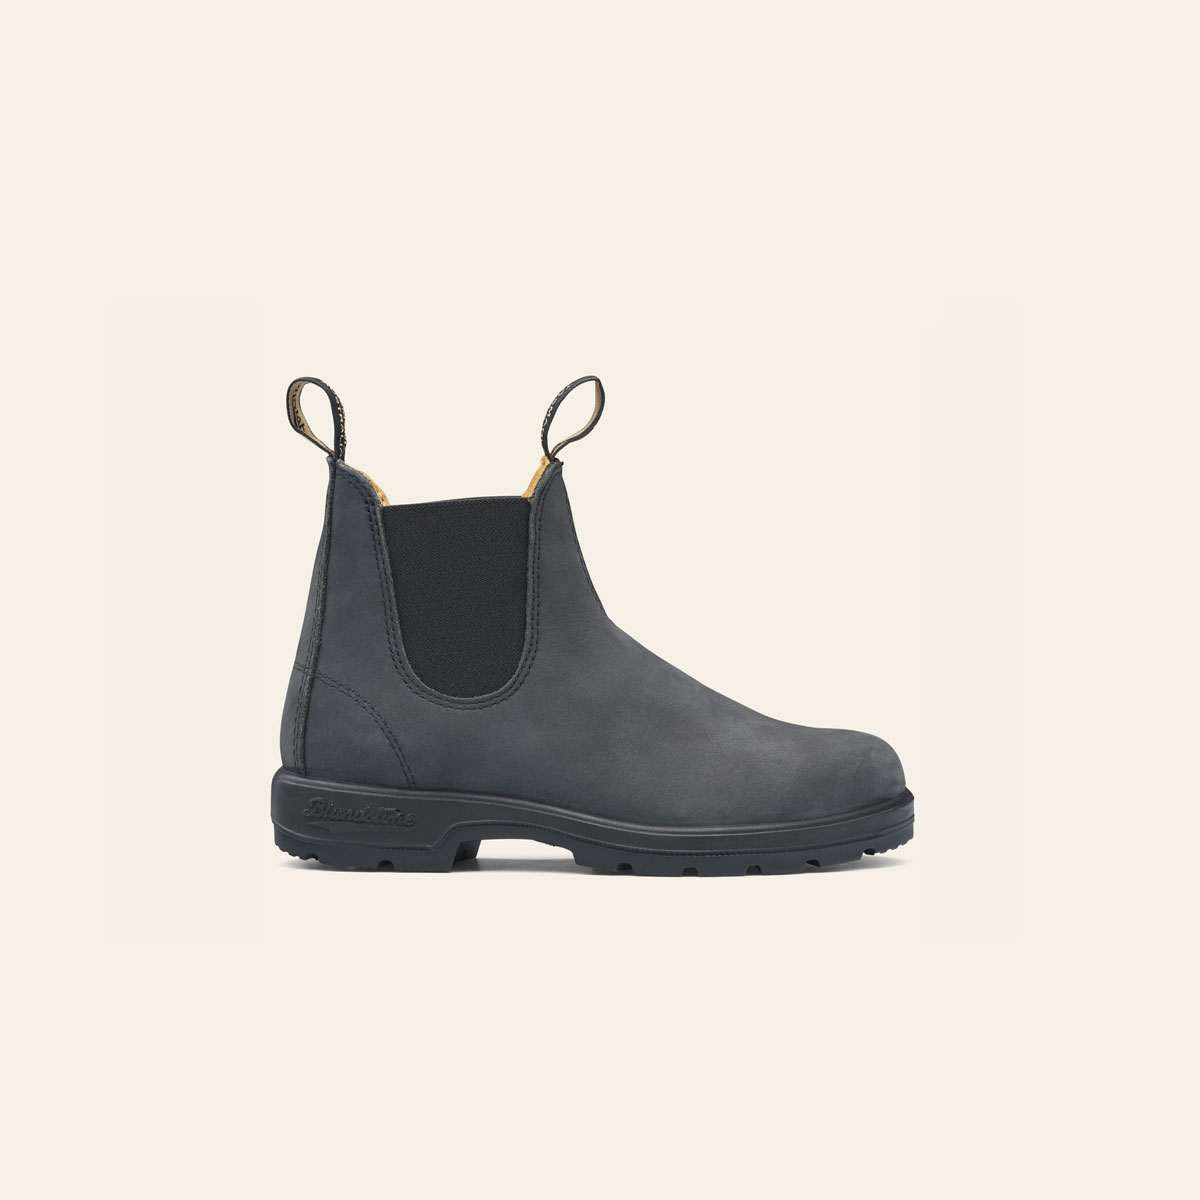 BLUNDSTONE Chelsea Boots 587 Rustic Black